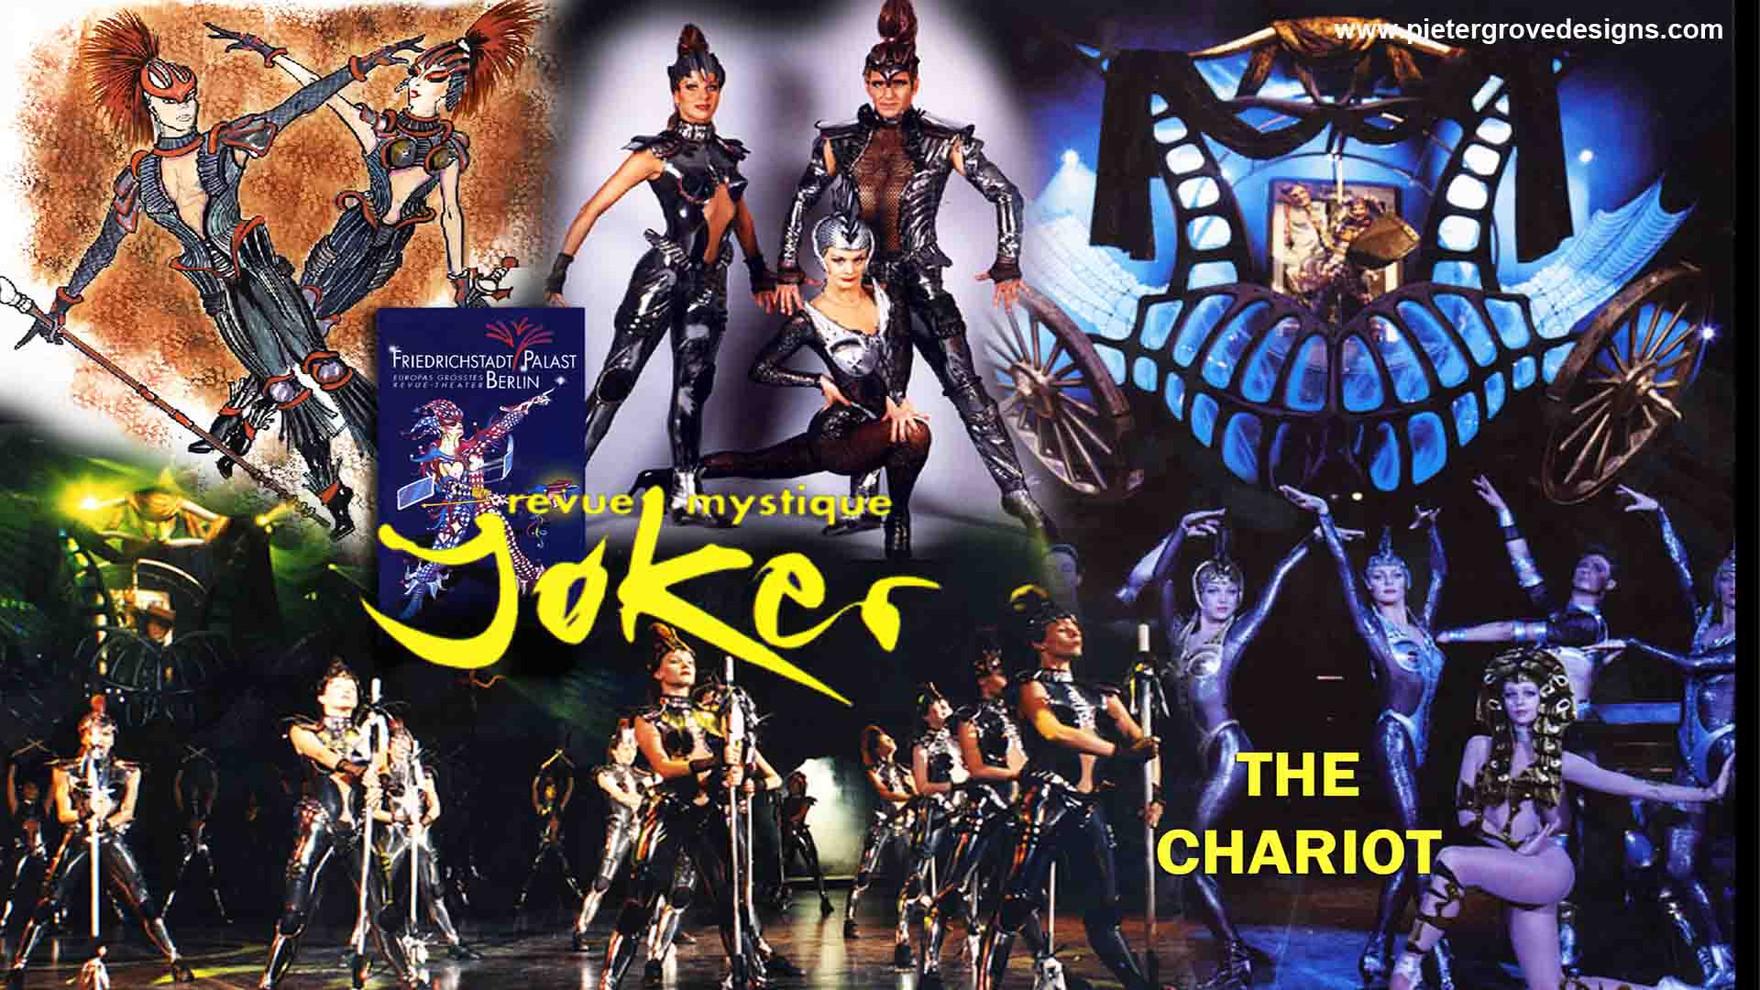 JokerThe Chariot_web.jpg